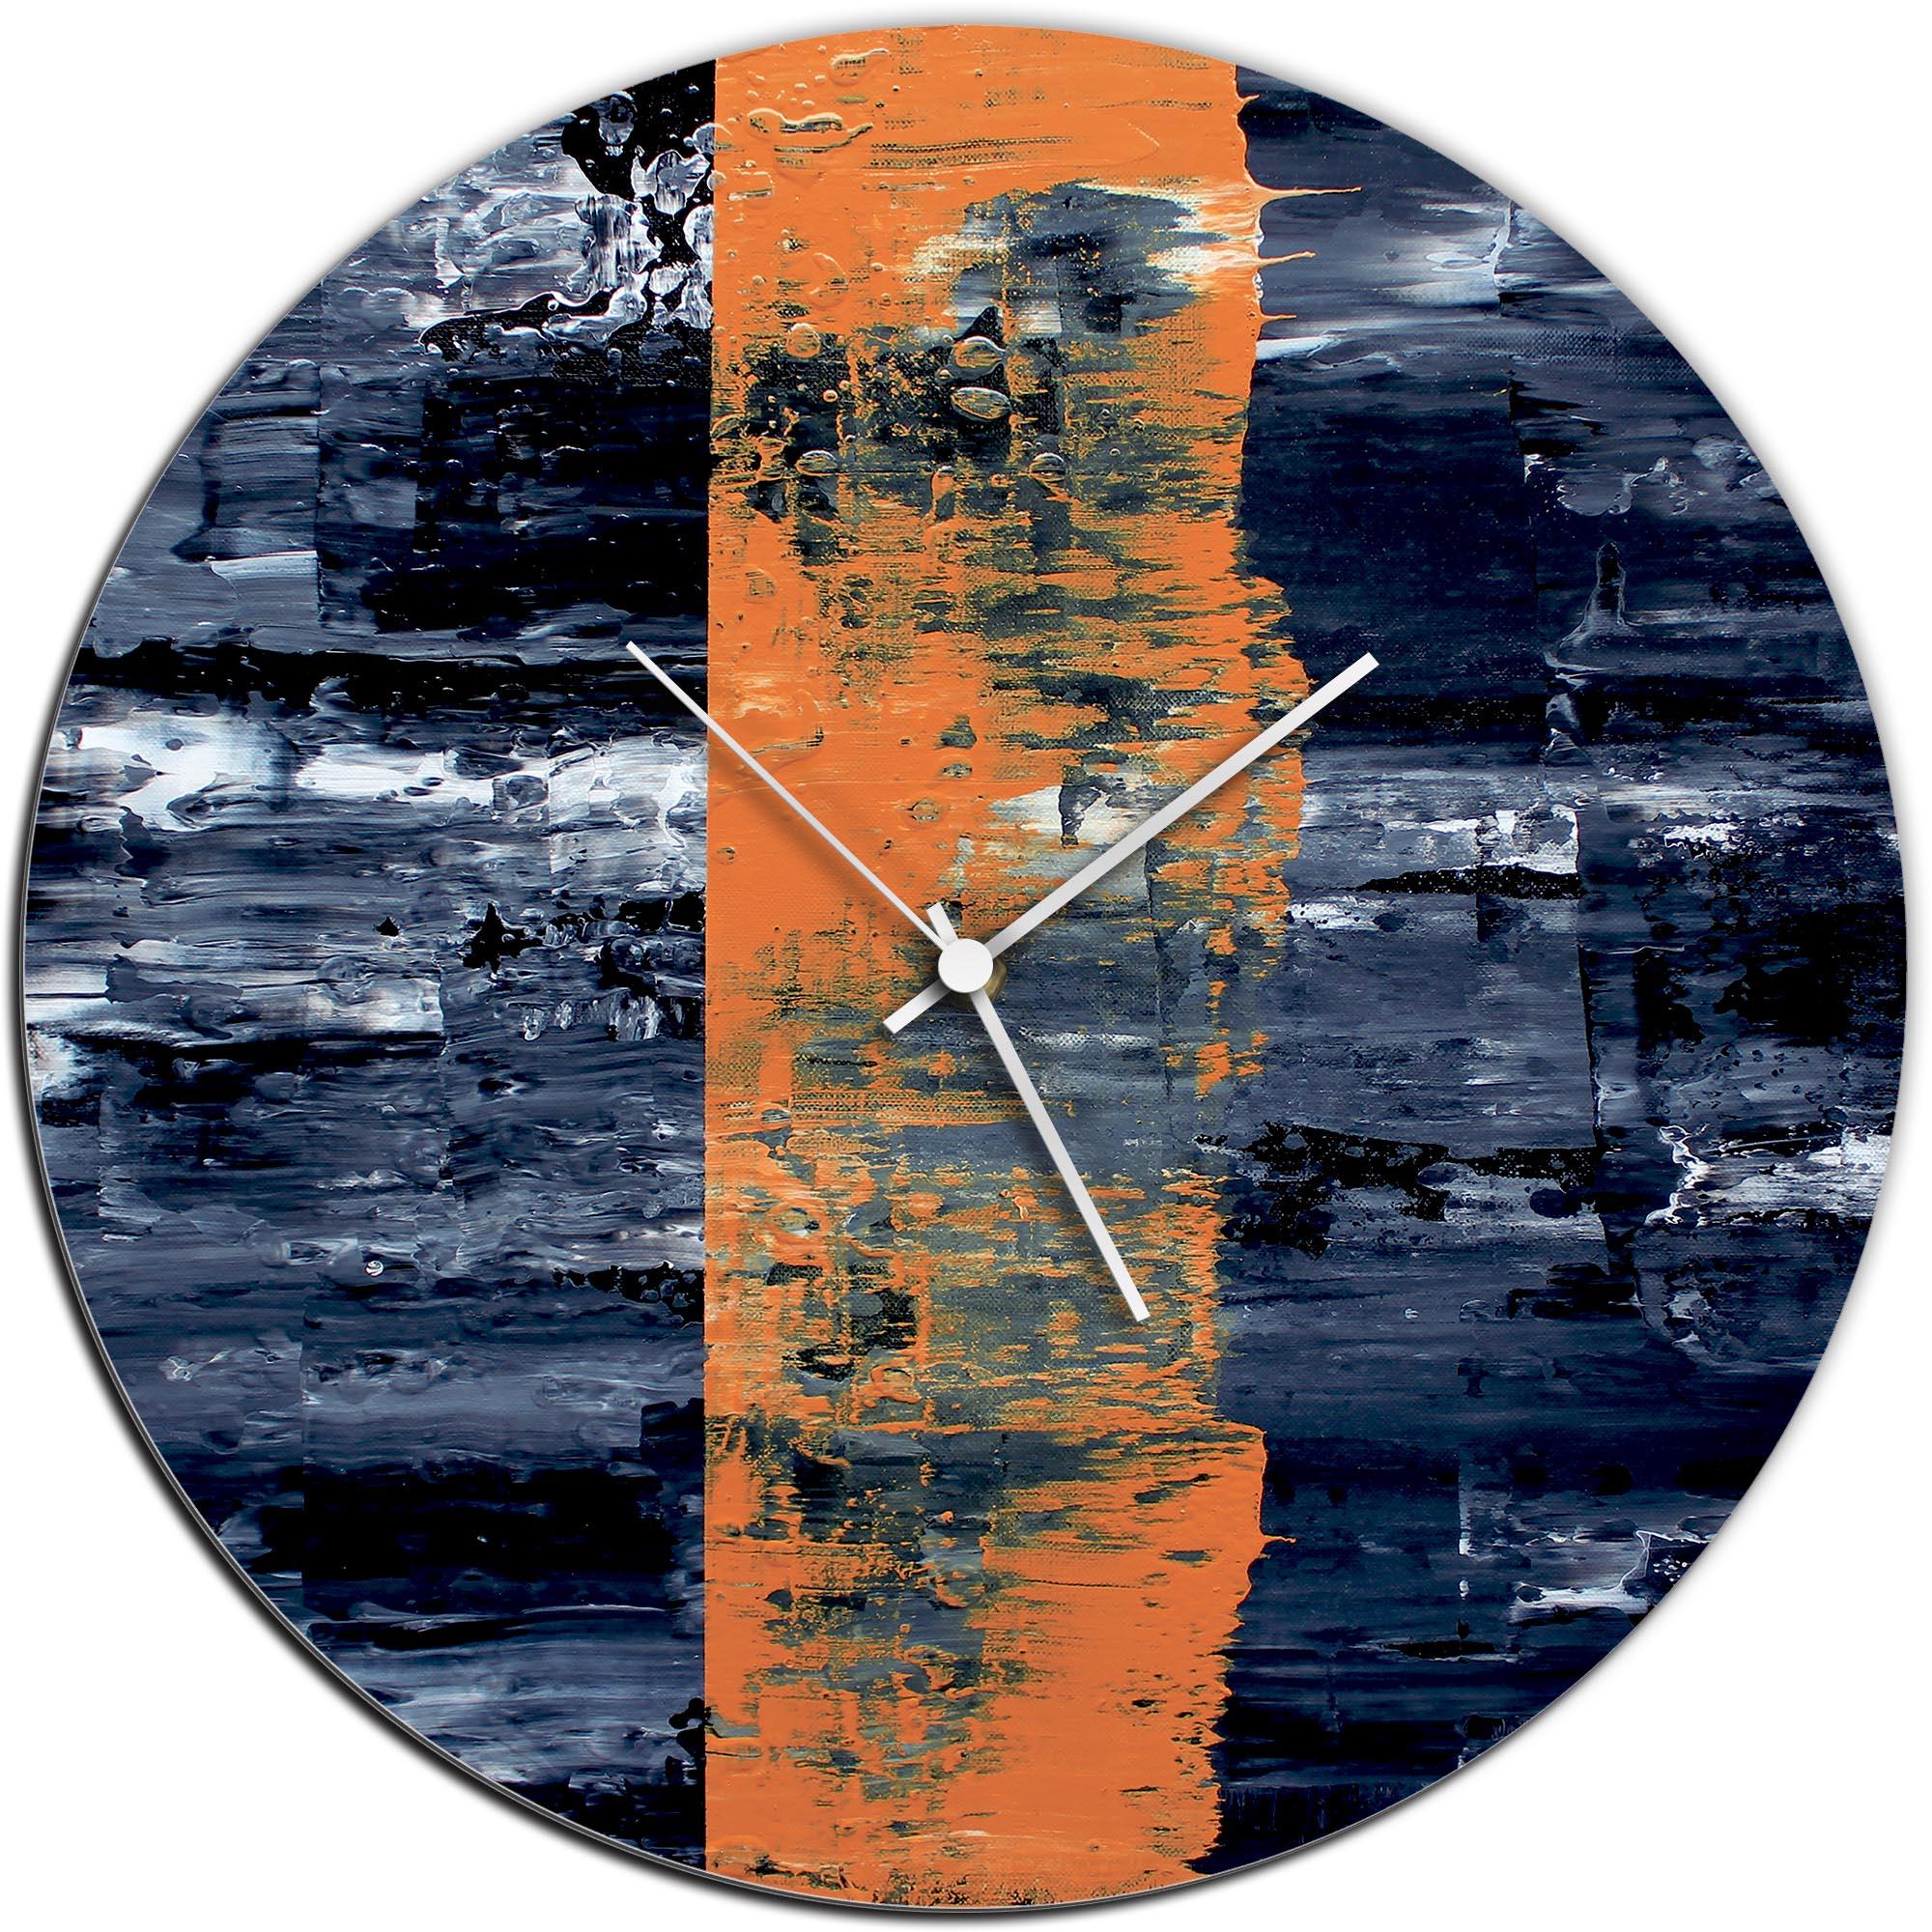 Mendo Vasilevski 'Orange Line Circle Clock' 16in x 16in Modern Wall Clock on Aluminum Composite